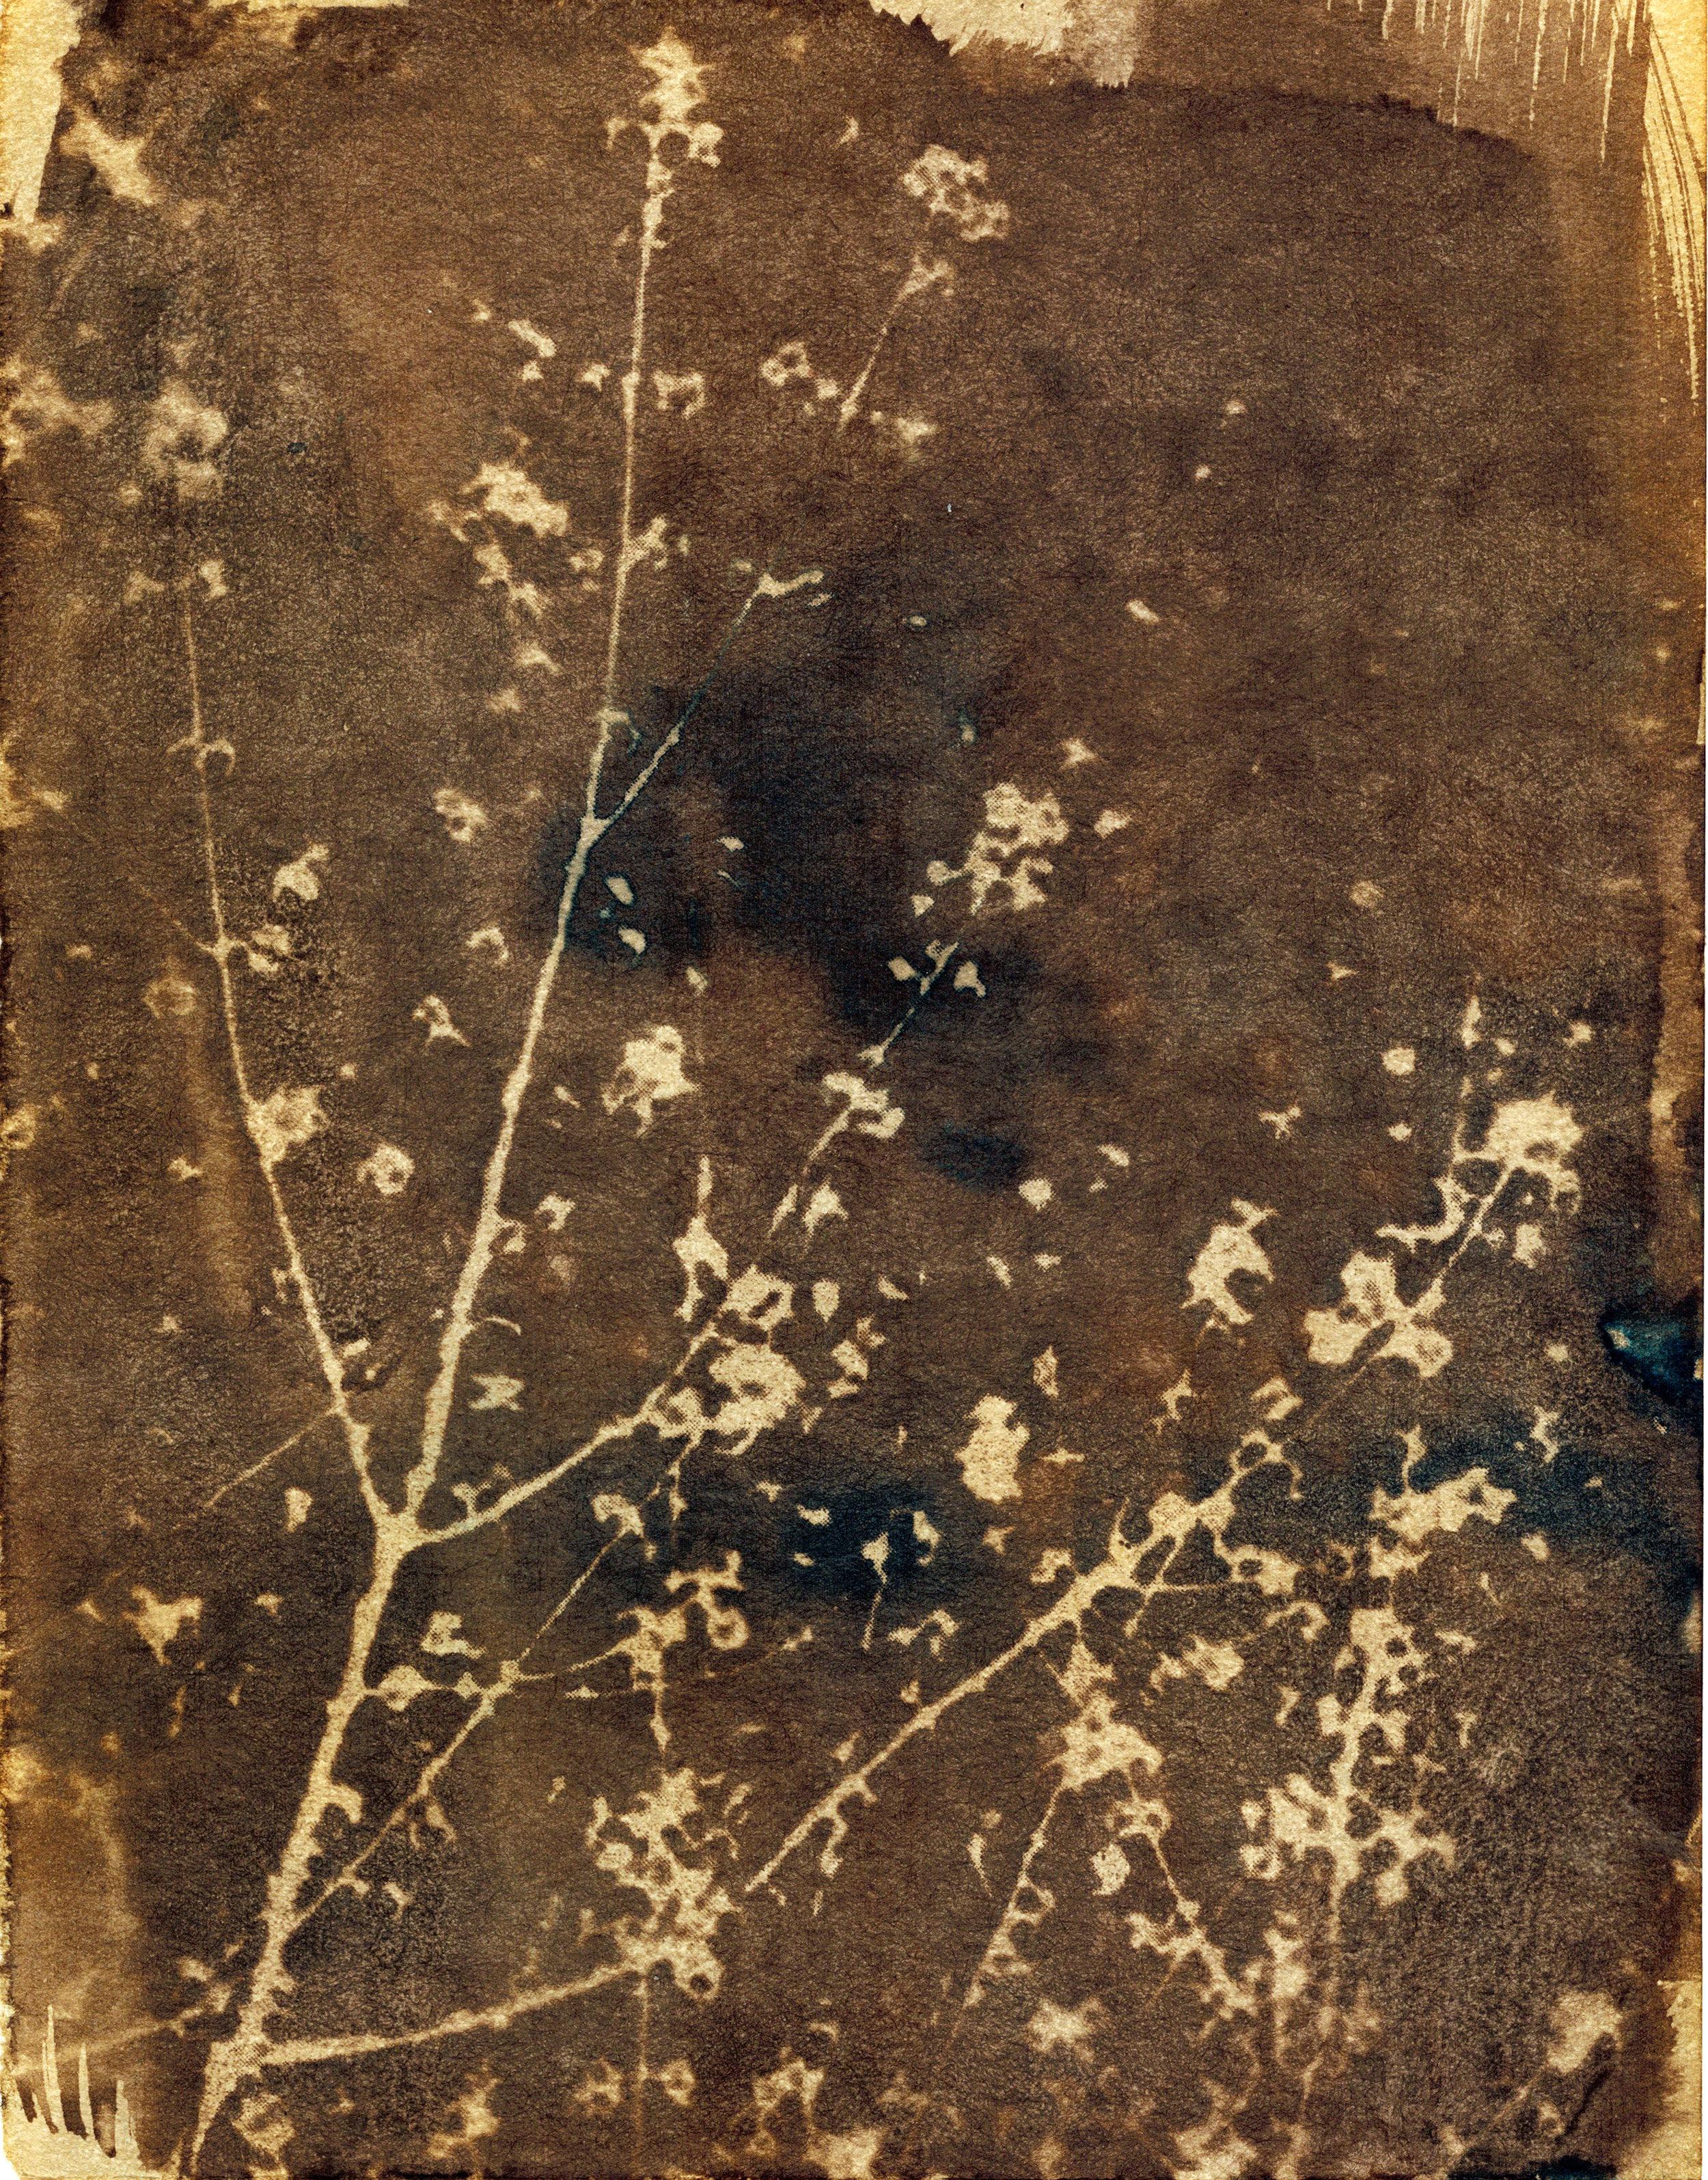 Toned Garden Cyanatope